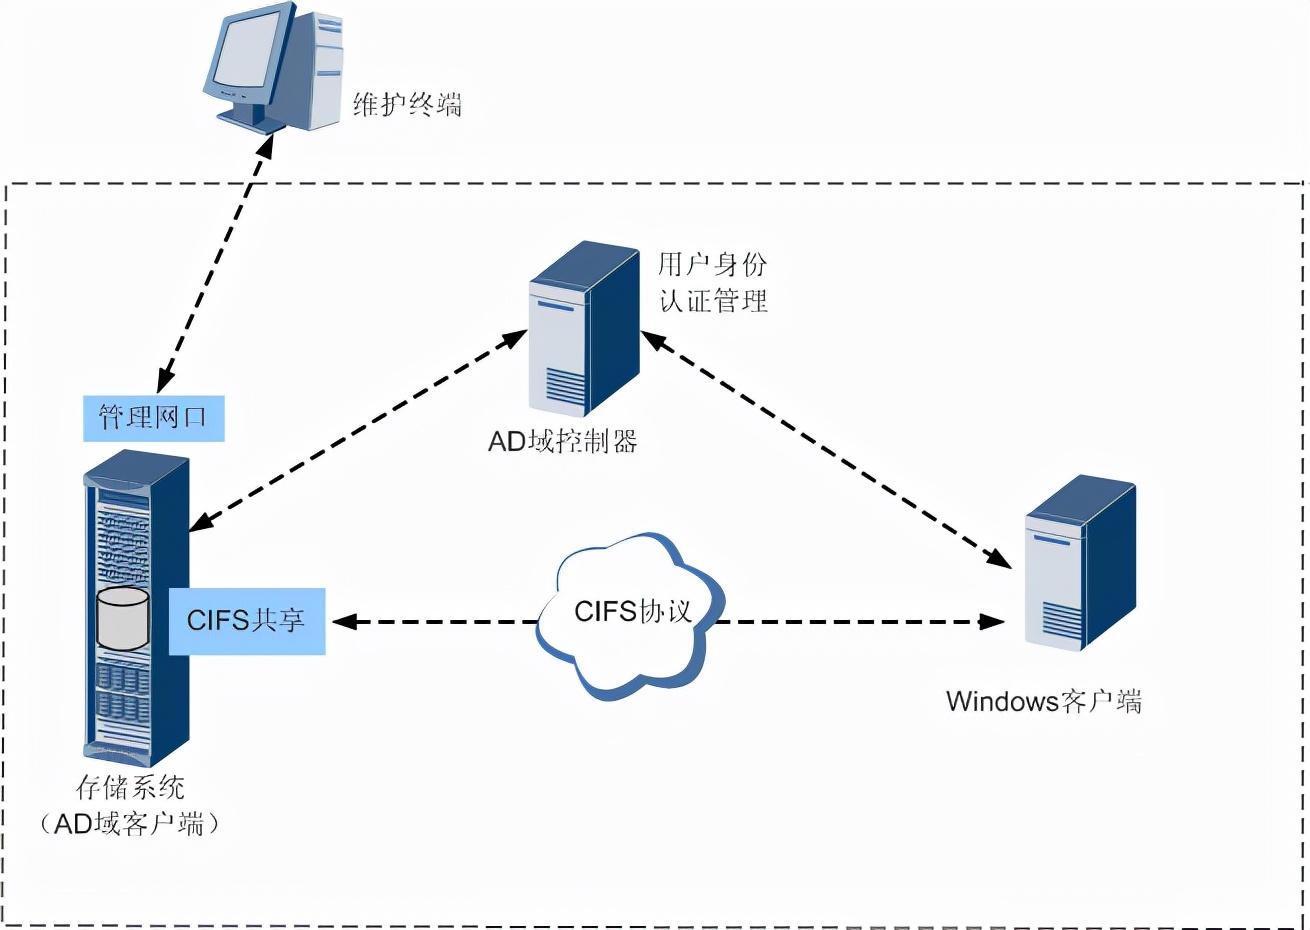 windows AD域_如何实现企业AD域高效,高质管理?